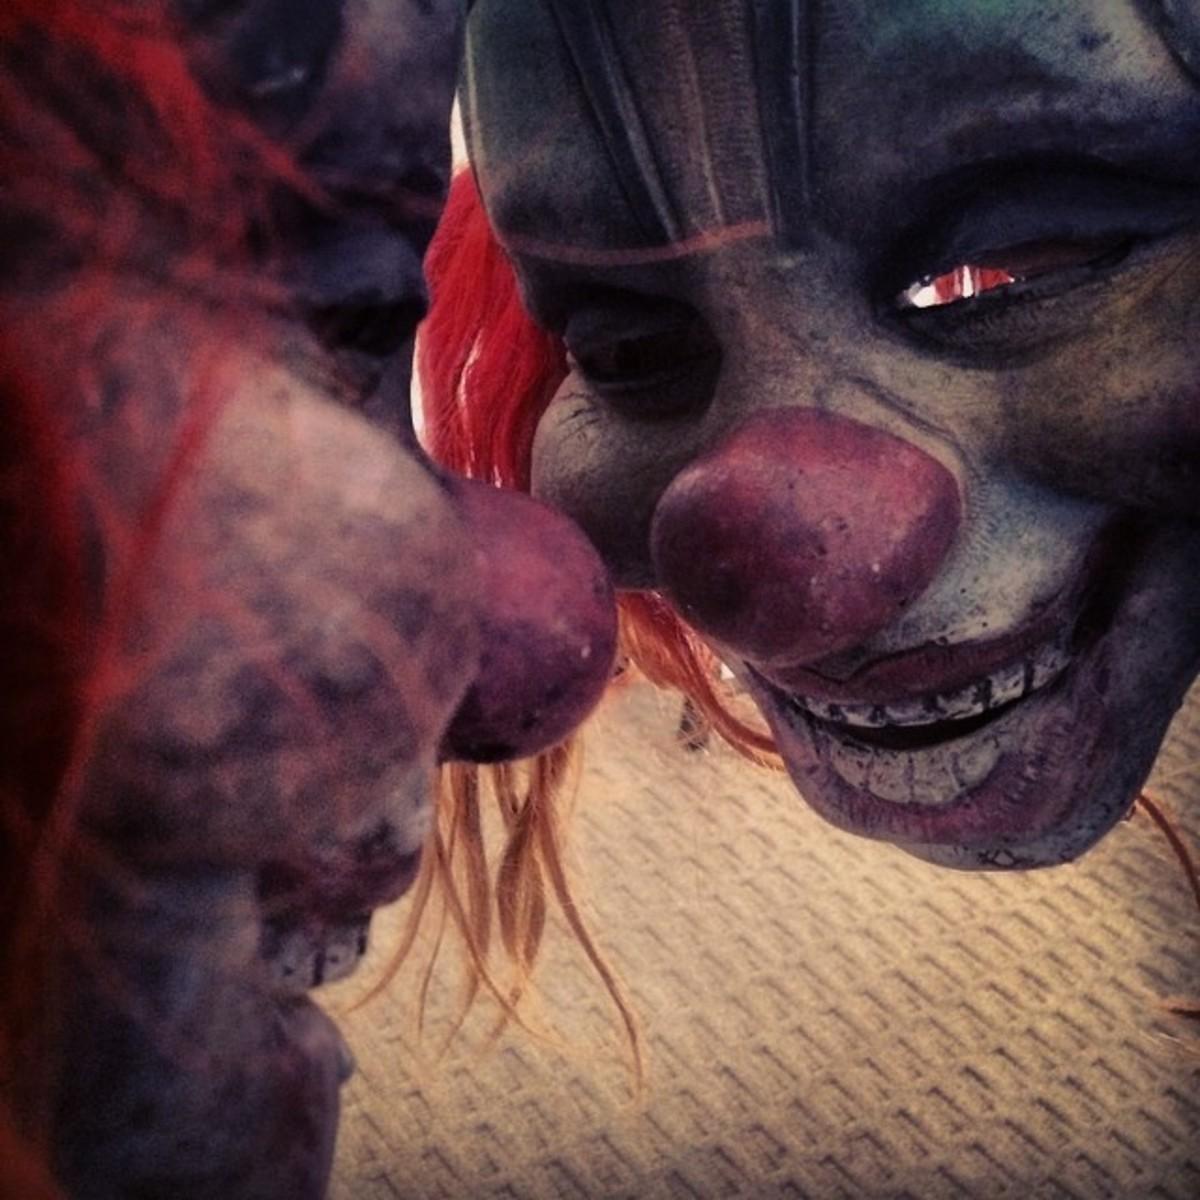 Creepy mirror shot of the Clown mask